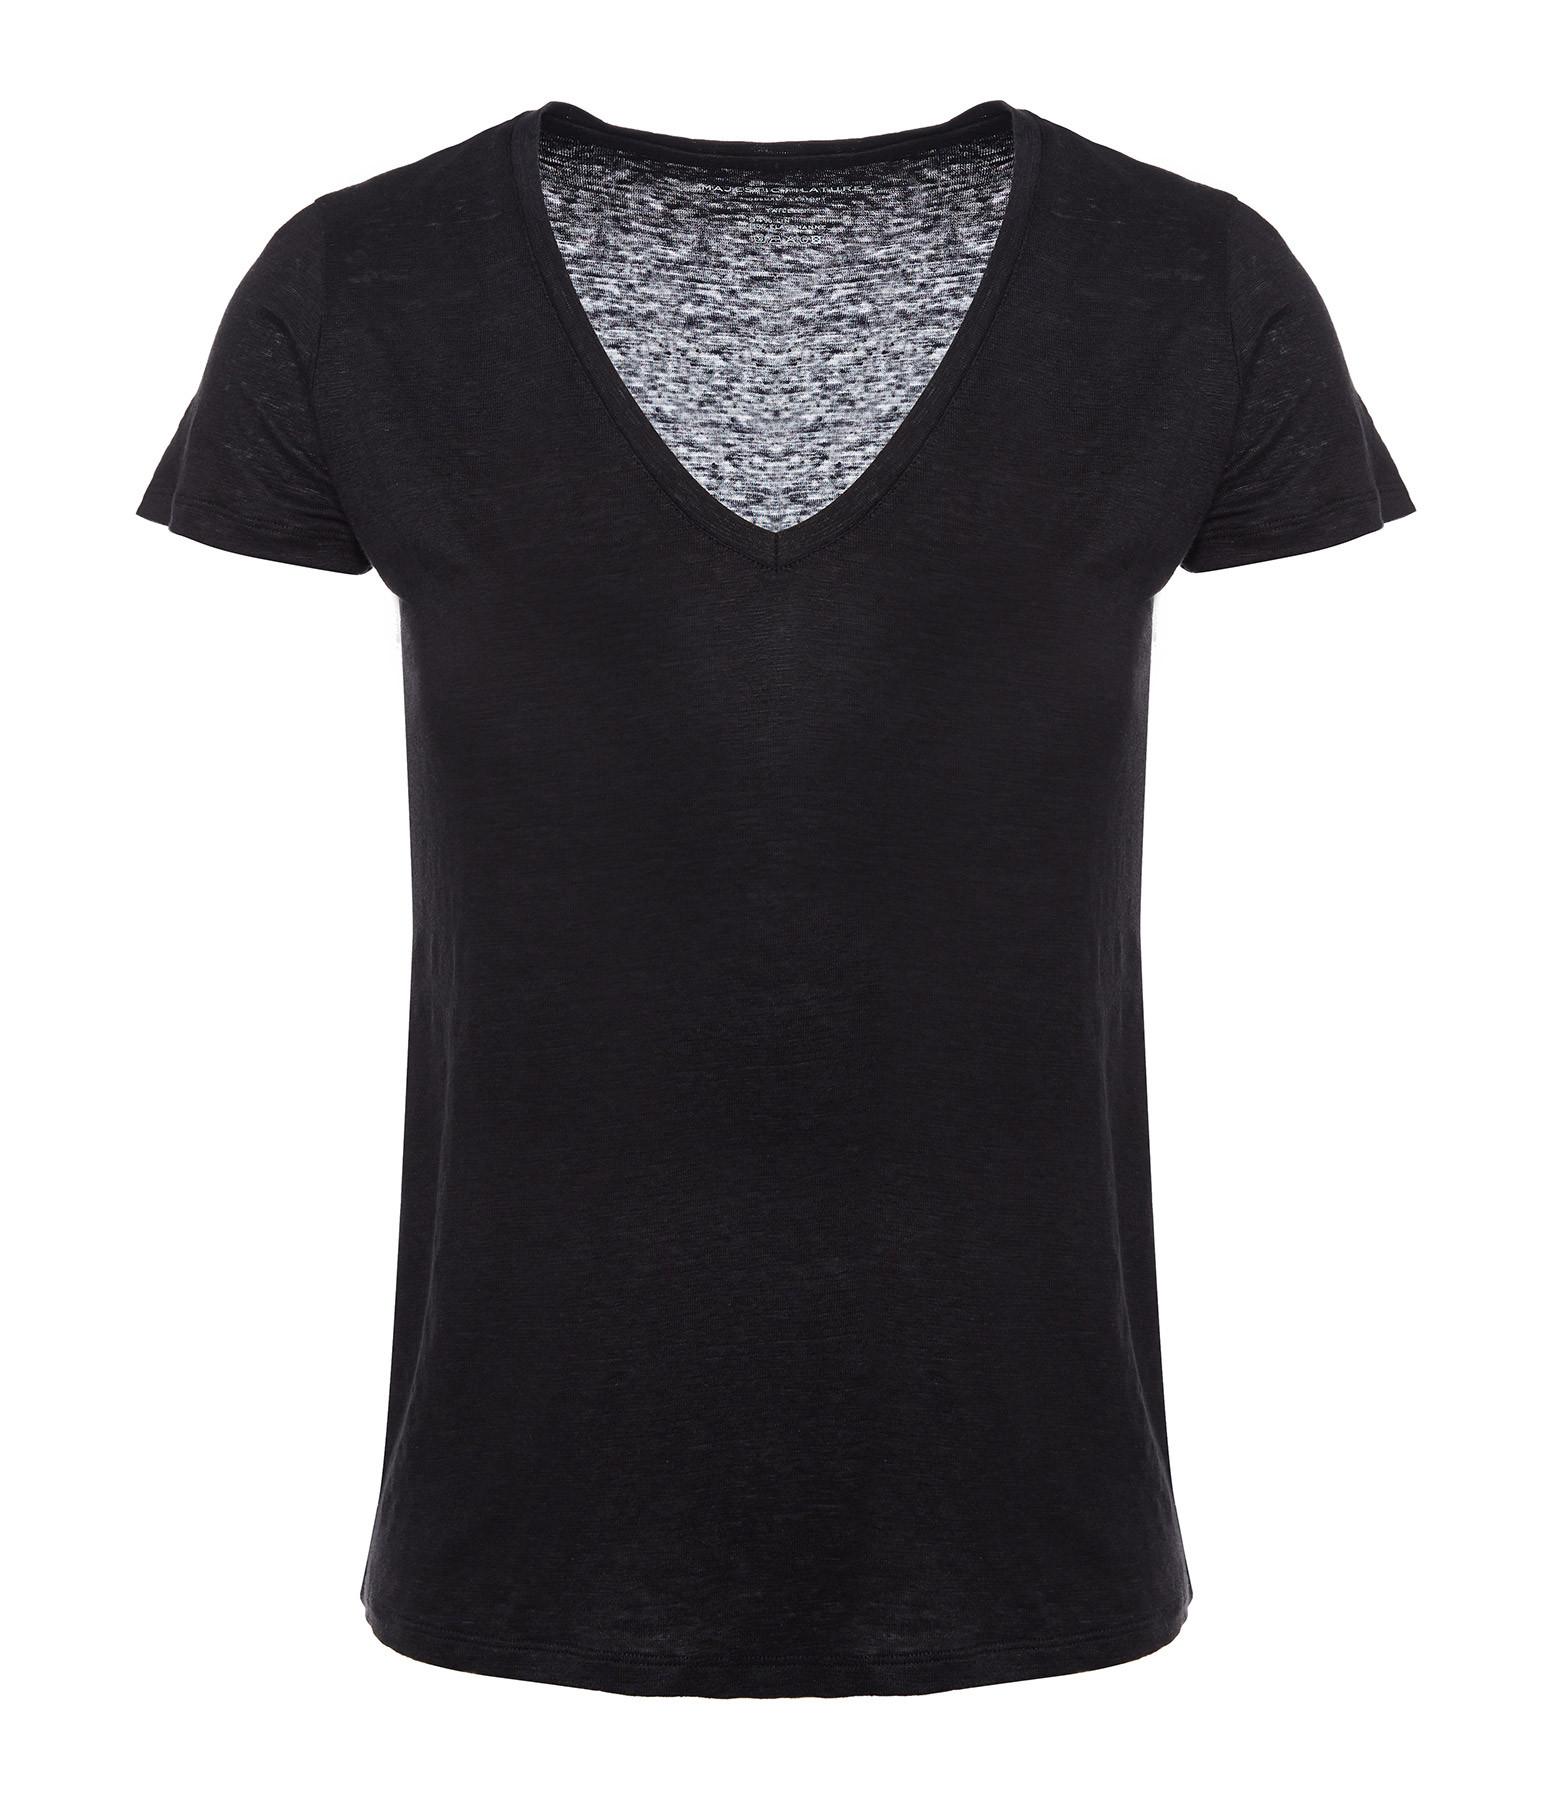 MAJESTIC FILATURES - Tee-shirt Lisa Col V Lin Noir